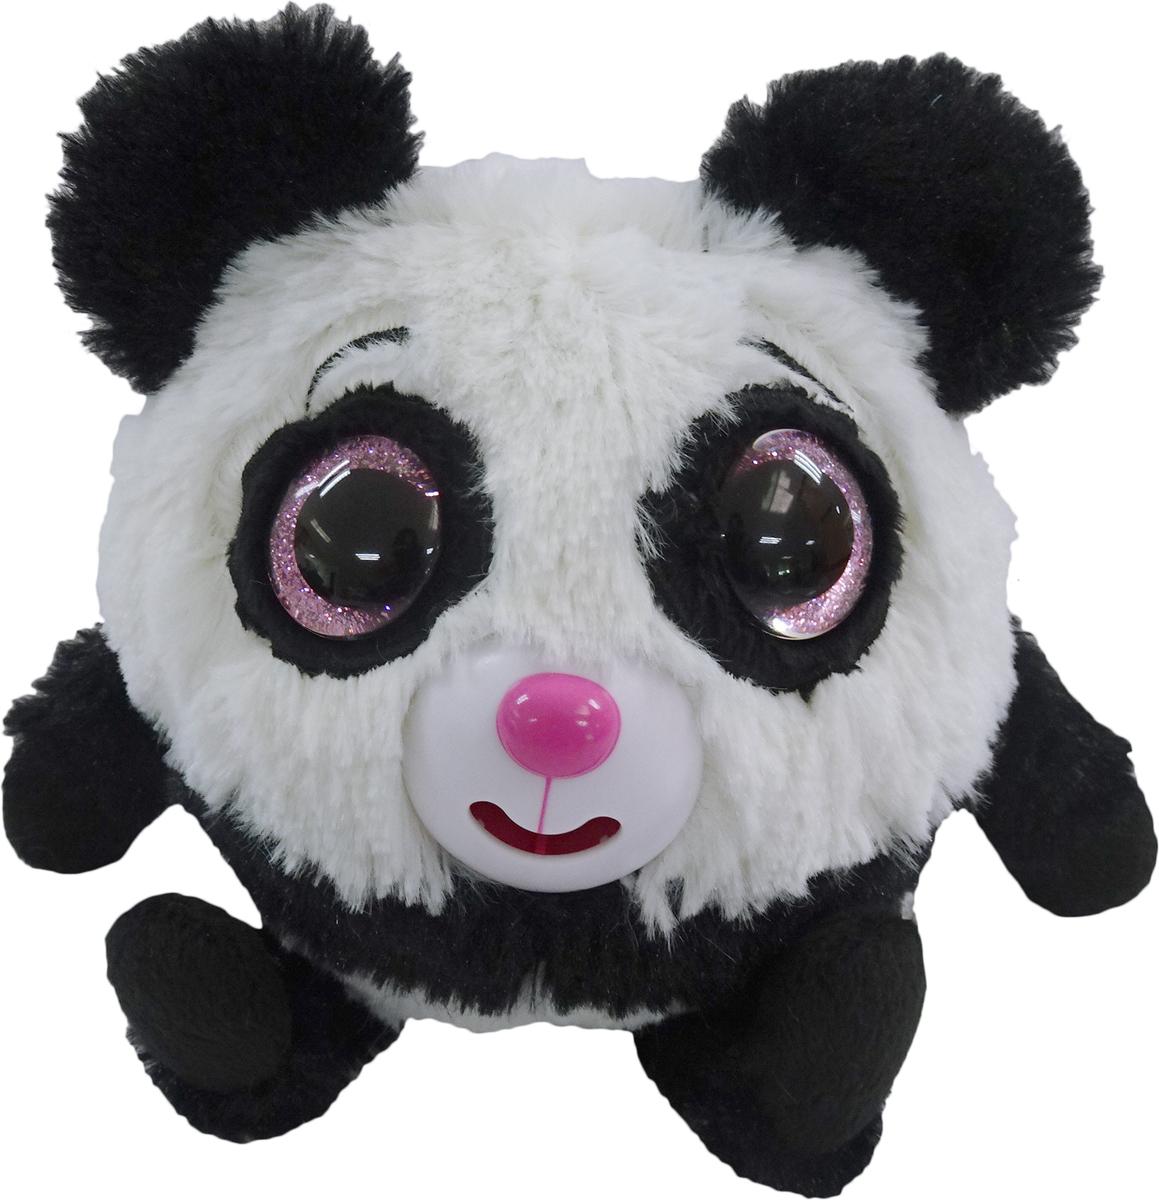 1TOYМягкая озвученная игрушка Дразнюка-Zoo Панда 13 см 1toyмягкая озвученная игрушка дразнюка zoo лисичка 13 см